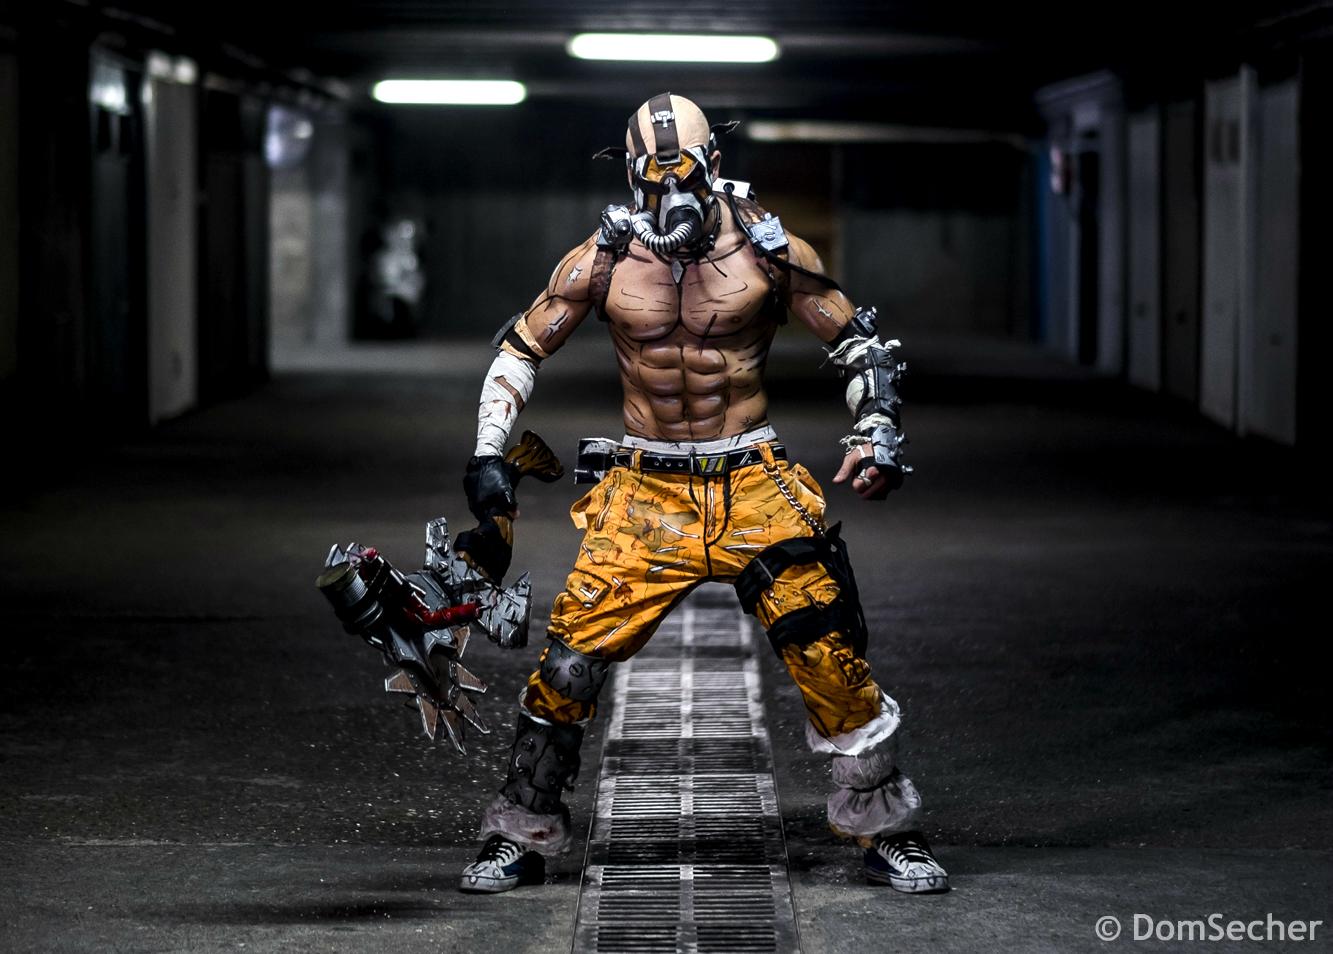 Psycho Krieg Cosplay - Borderlands 2 2K 2015